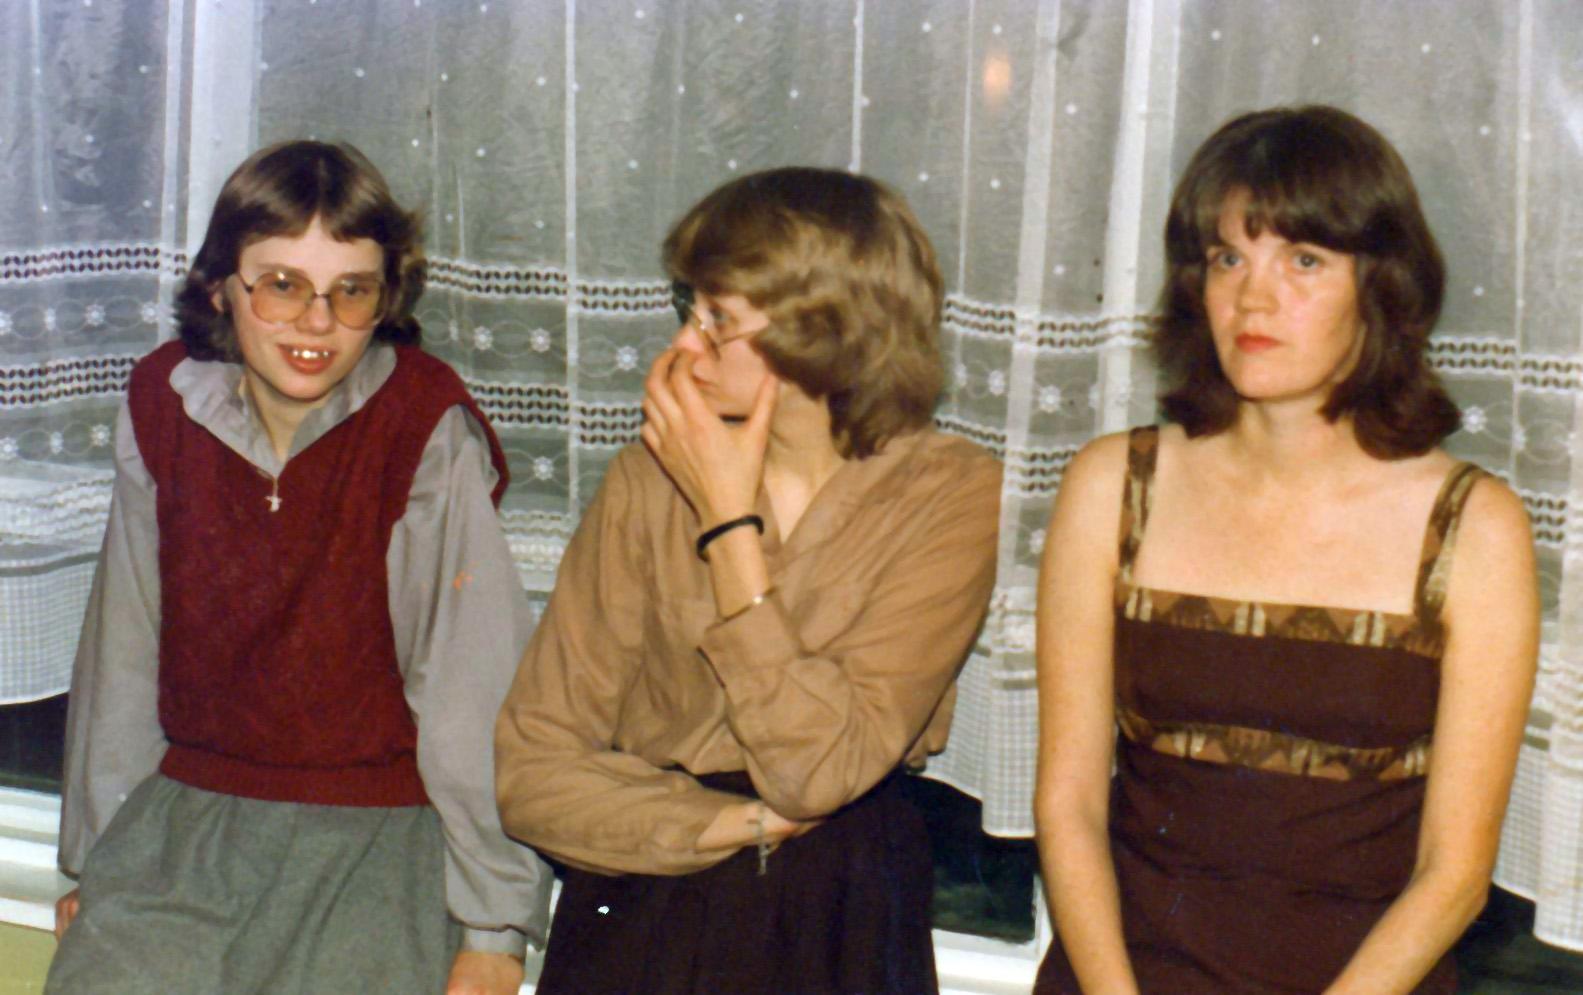 untitled30 þorrabl 1979 elsa barb kolbrún guðbjörg-.jpg